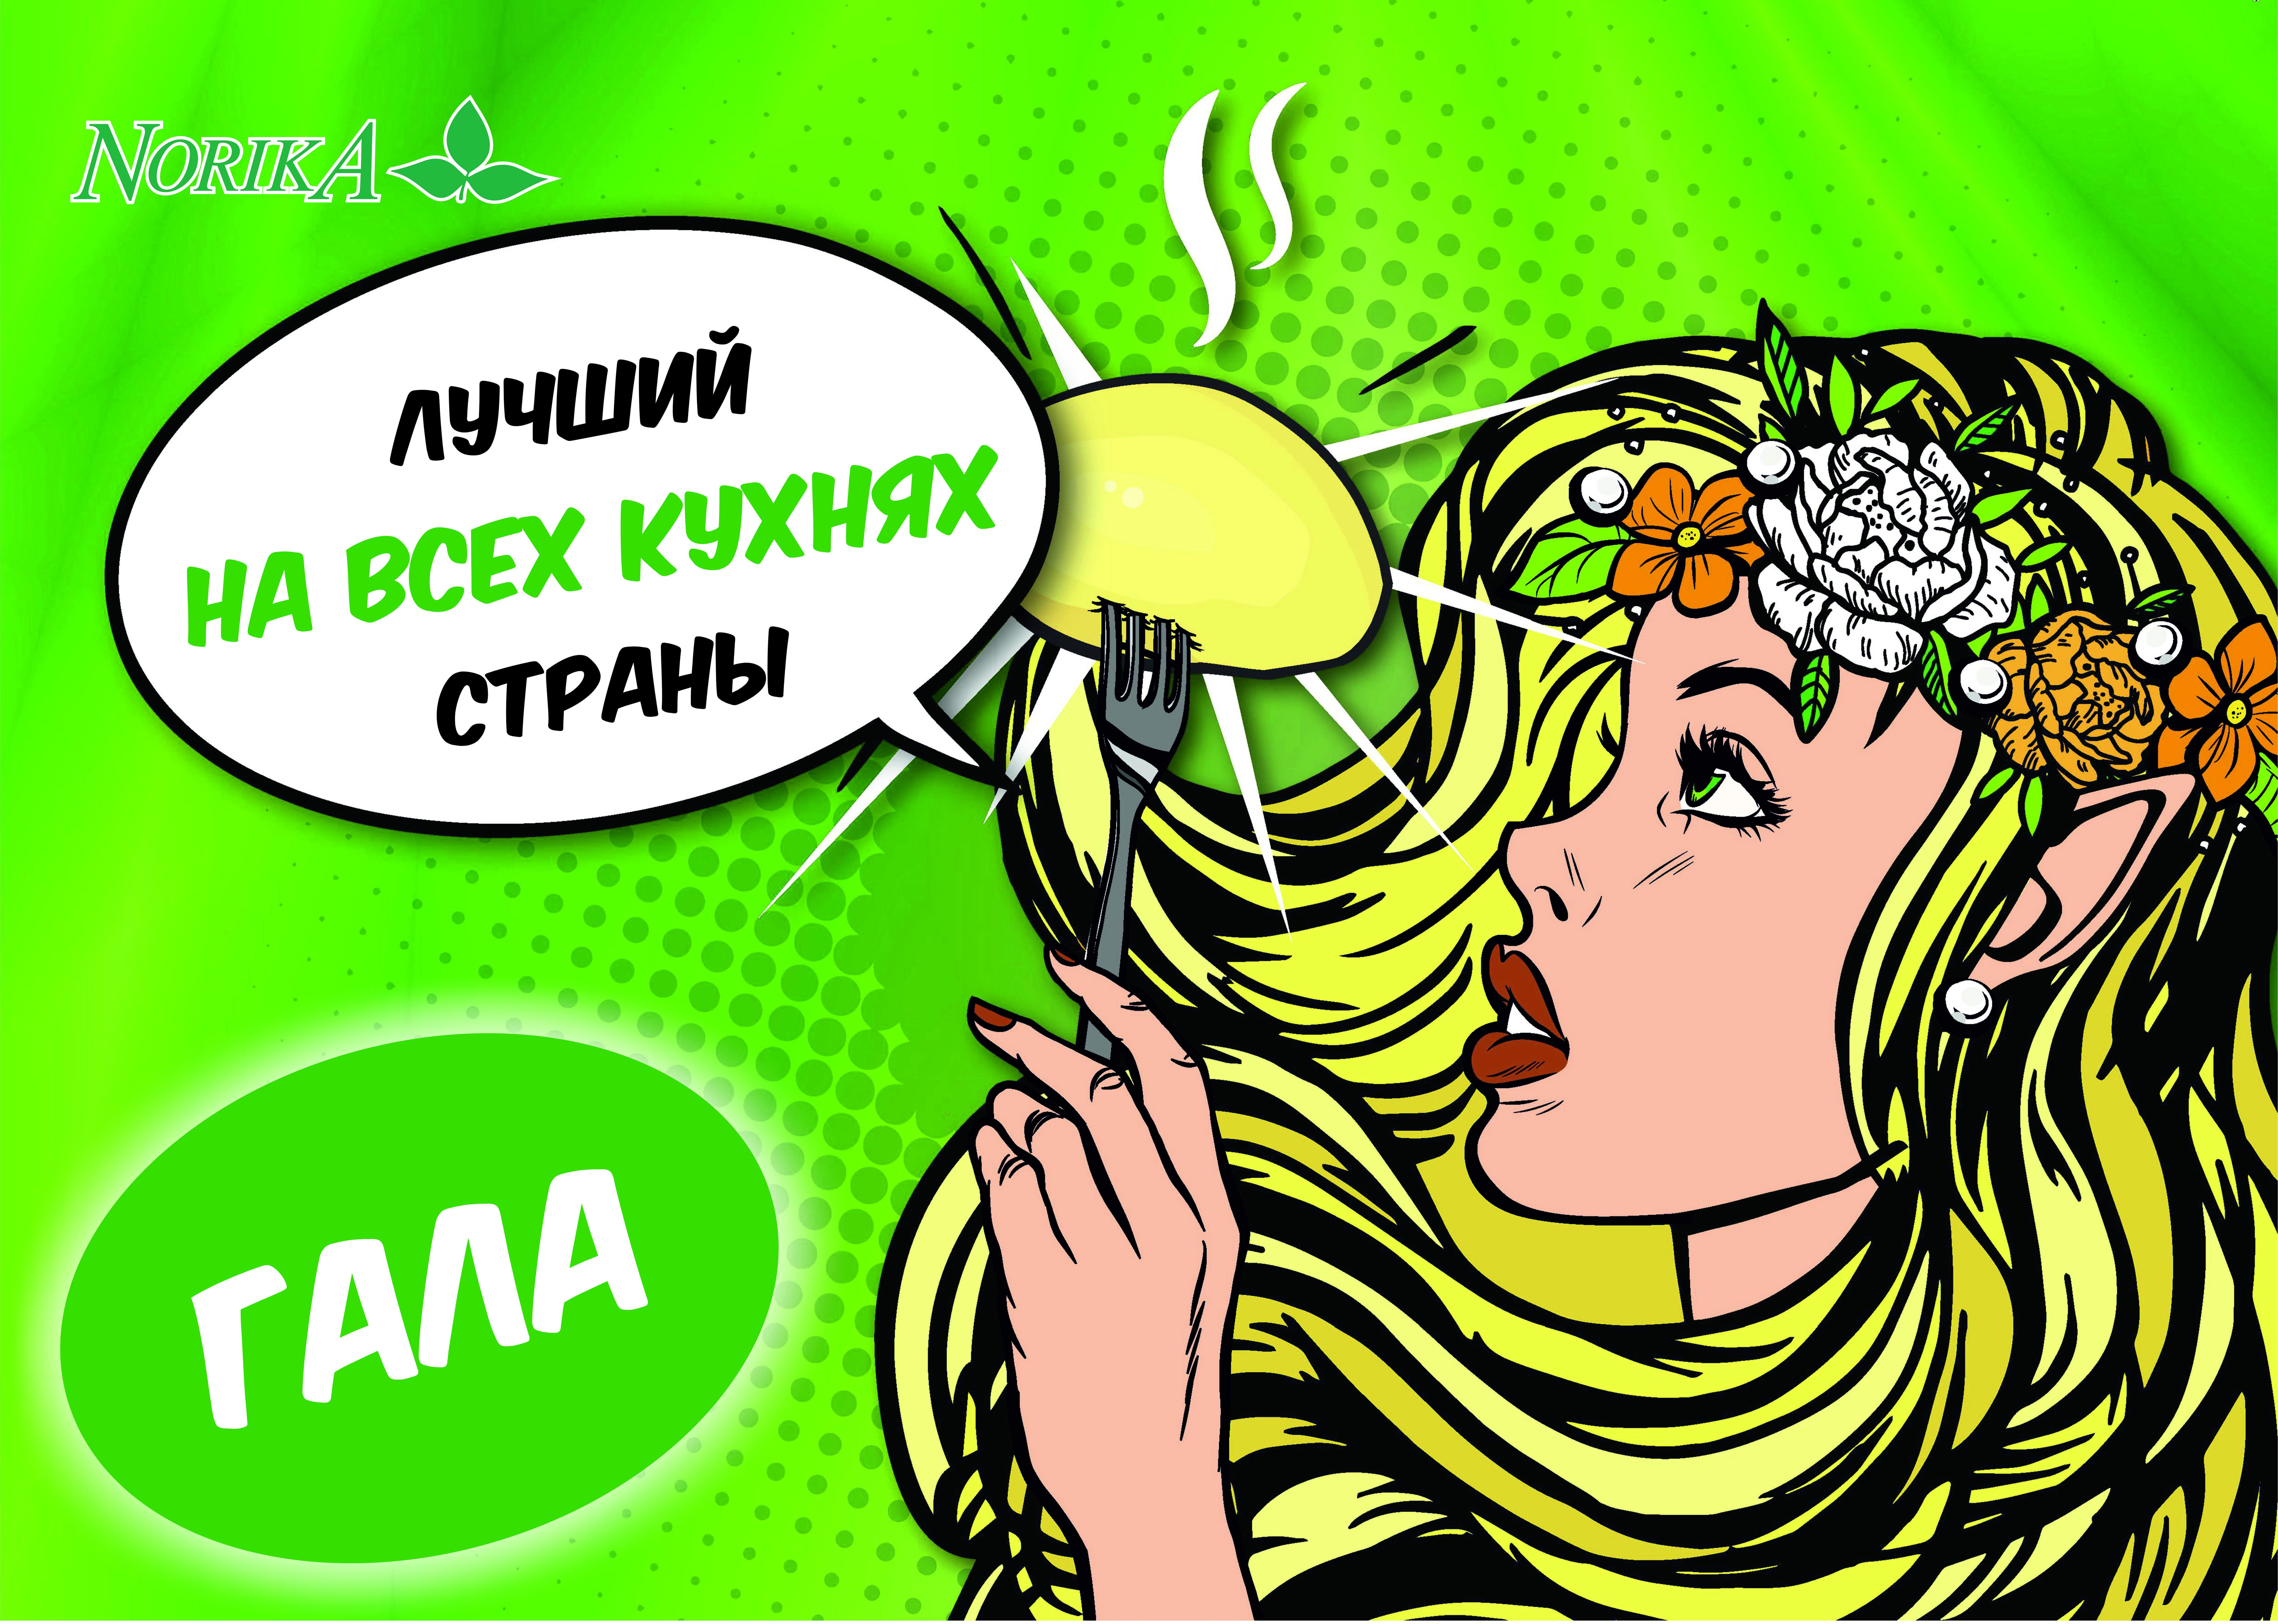 Gala_banner_850x606-green